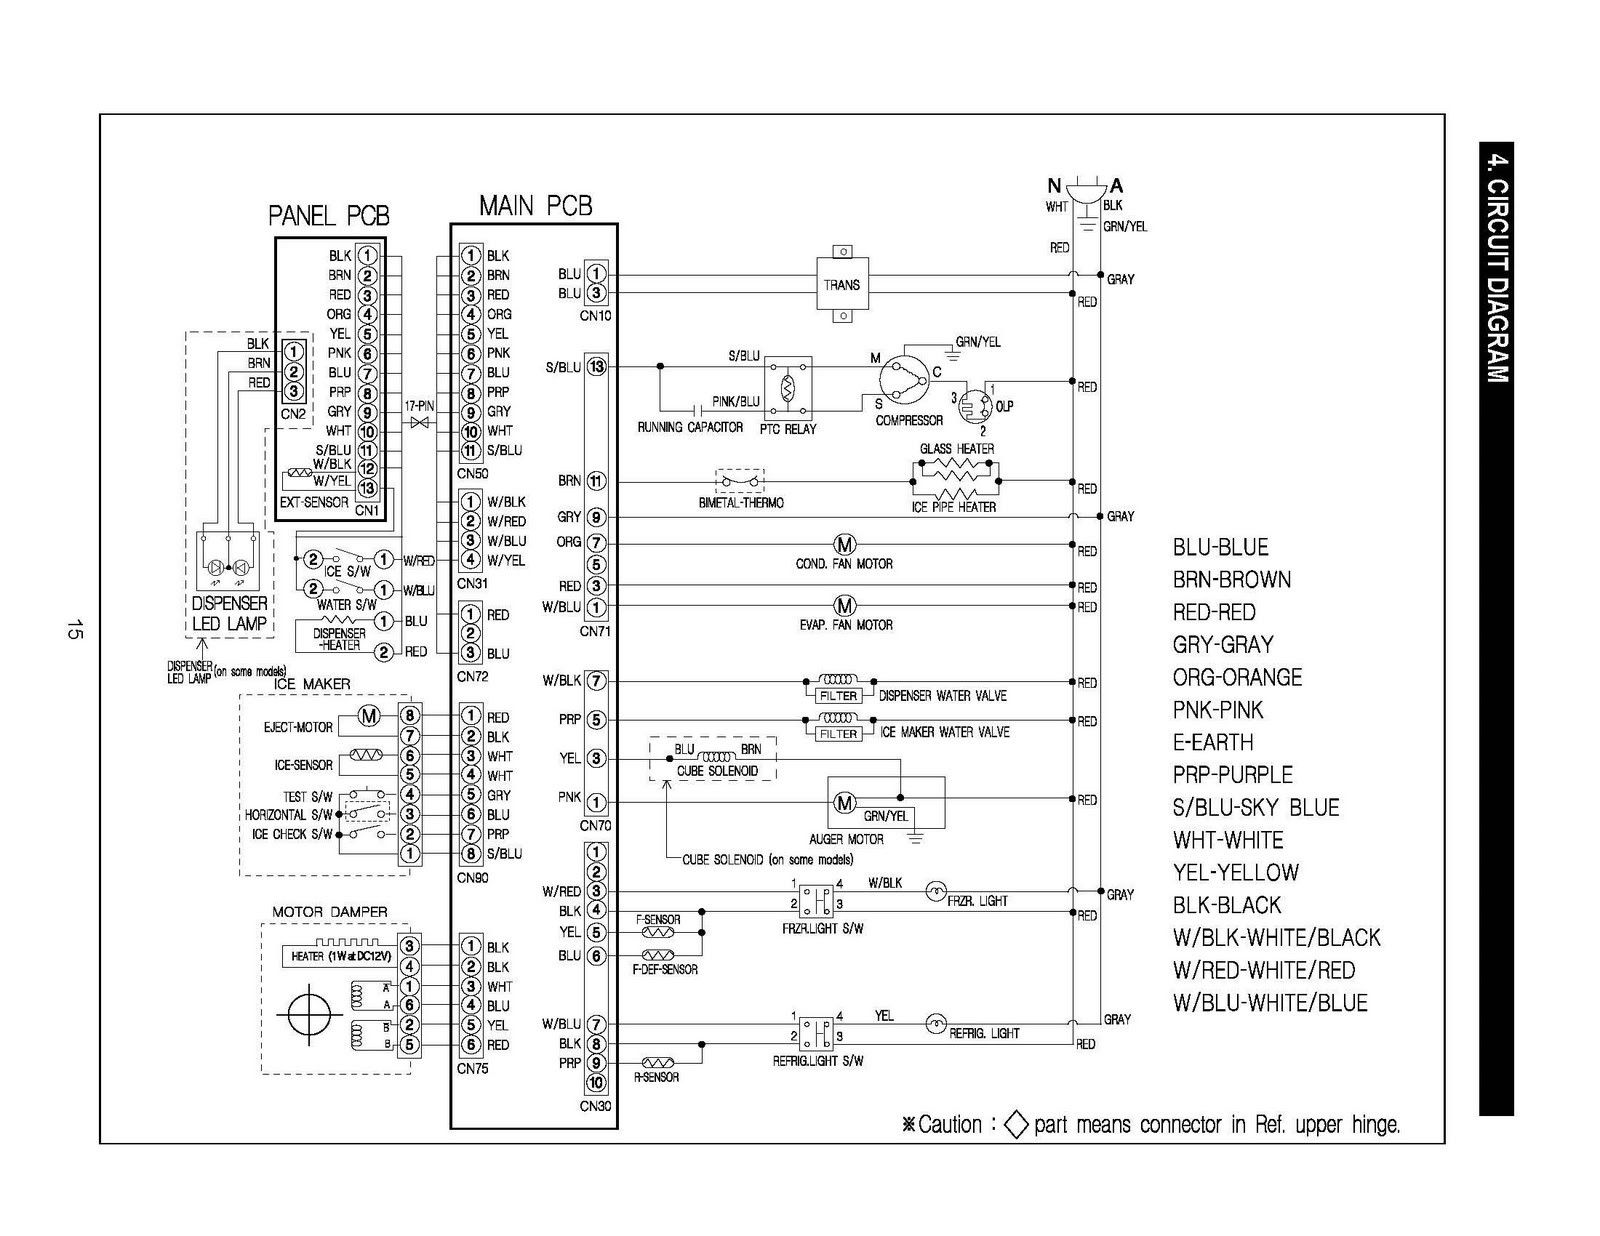 Ge Refrigerator Wiring Diagram Best Of Ge Monogram Wiring Diagram Wiring  Diagrams | Eyeliner shapes, Diagram, Pics Pinterest